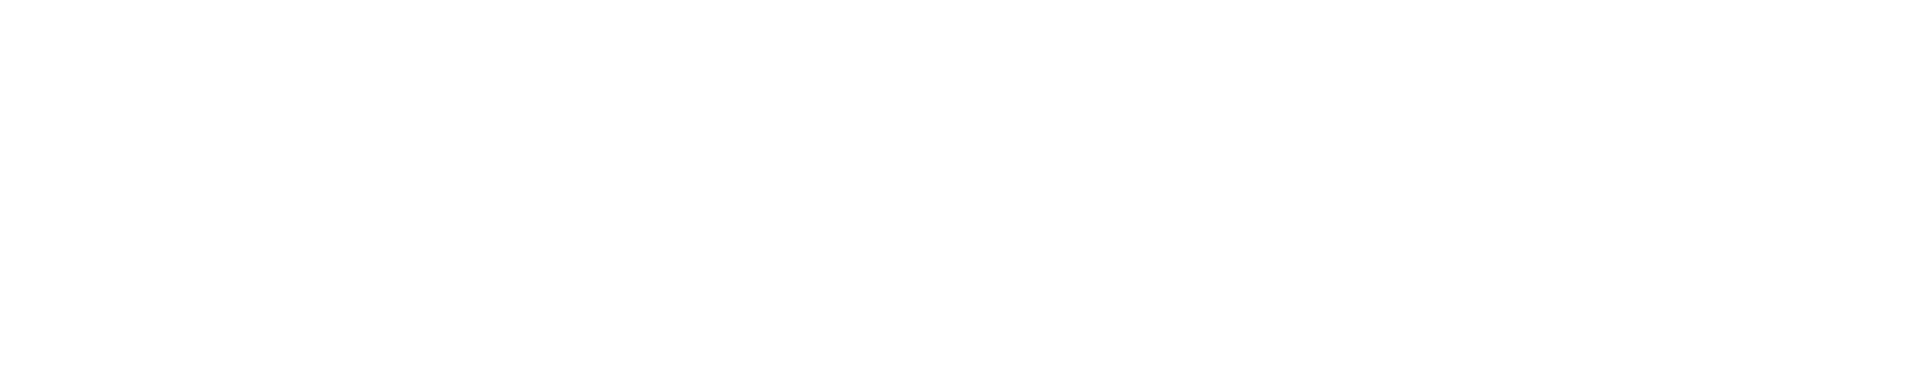 IMB-protector